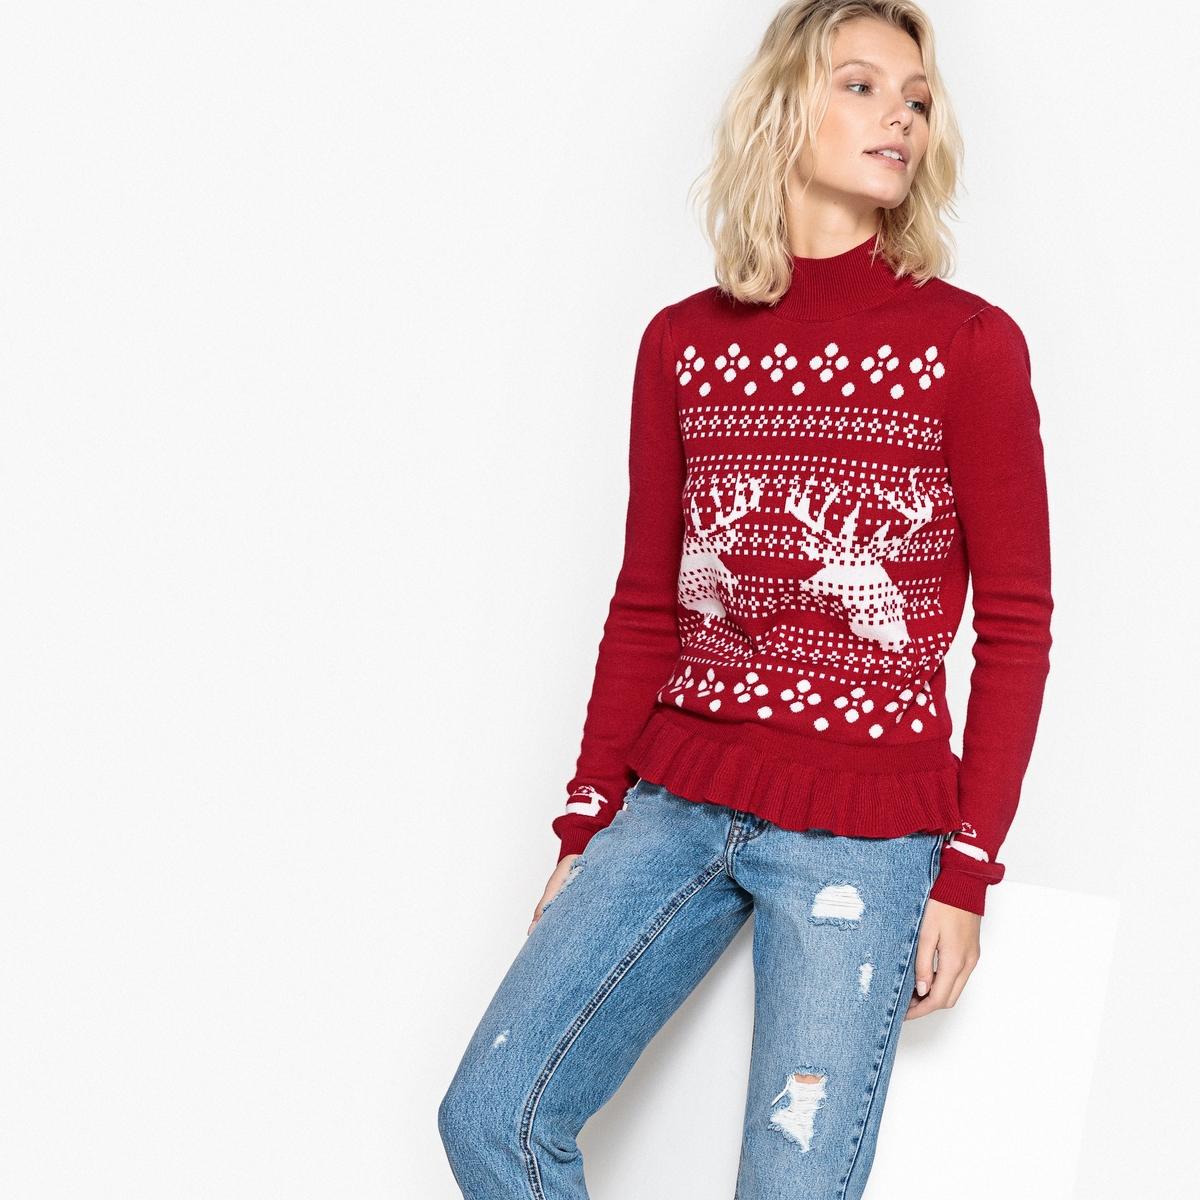 Пуловер с новогодним мотивом